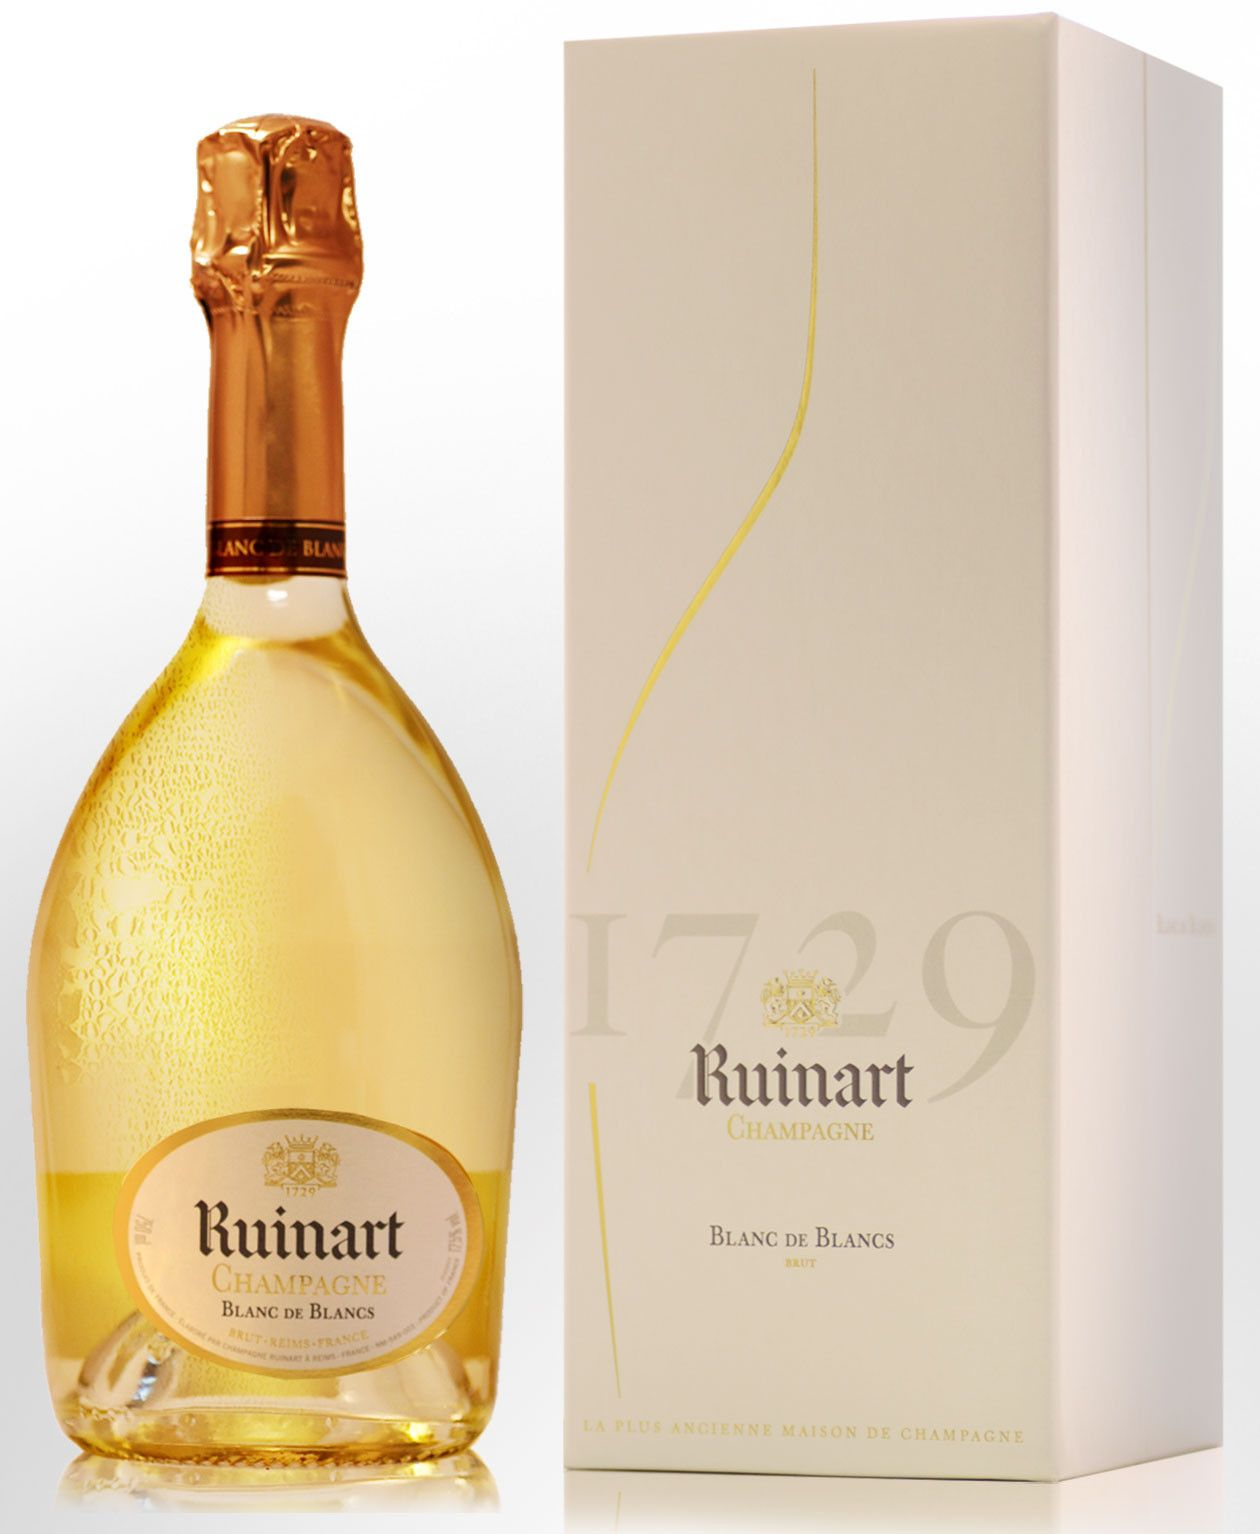 Ruinart Blanc De Blancs Champagne Champagne Rose Wine Bottle Wine Bottle